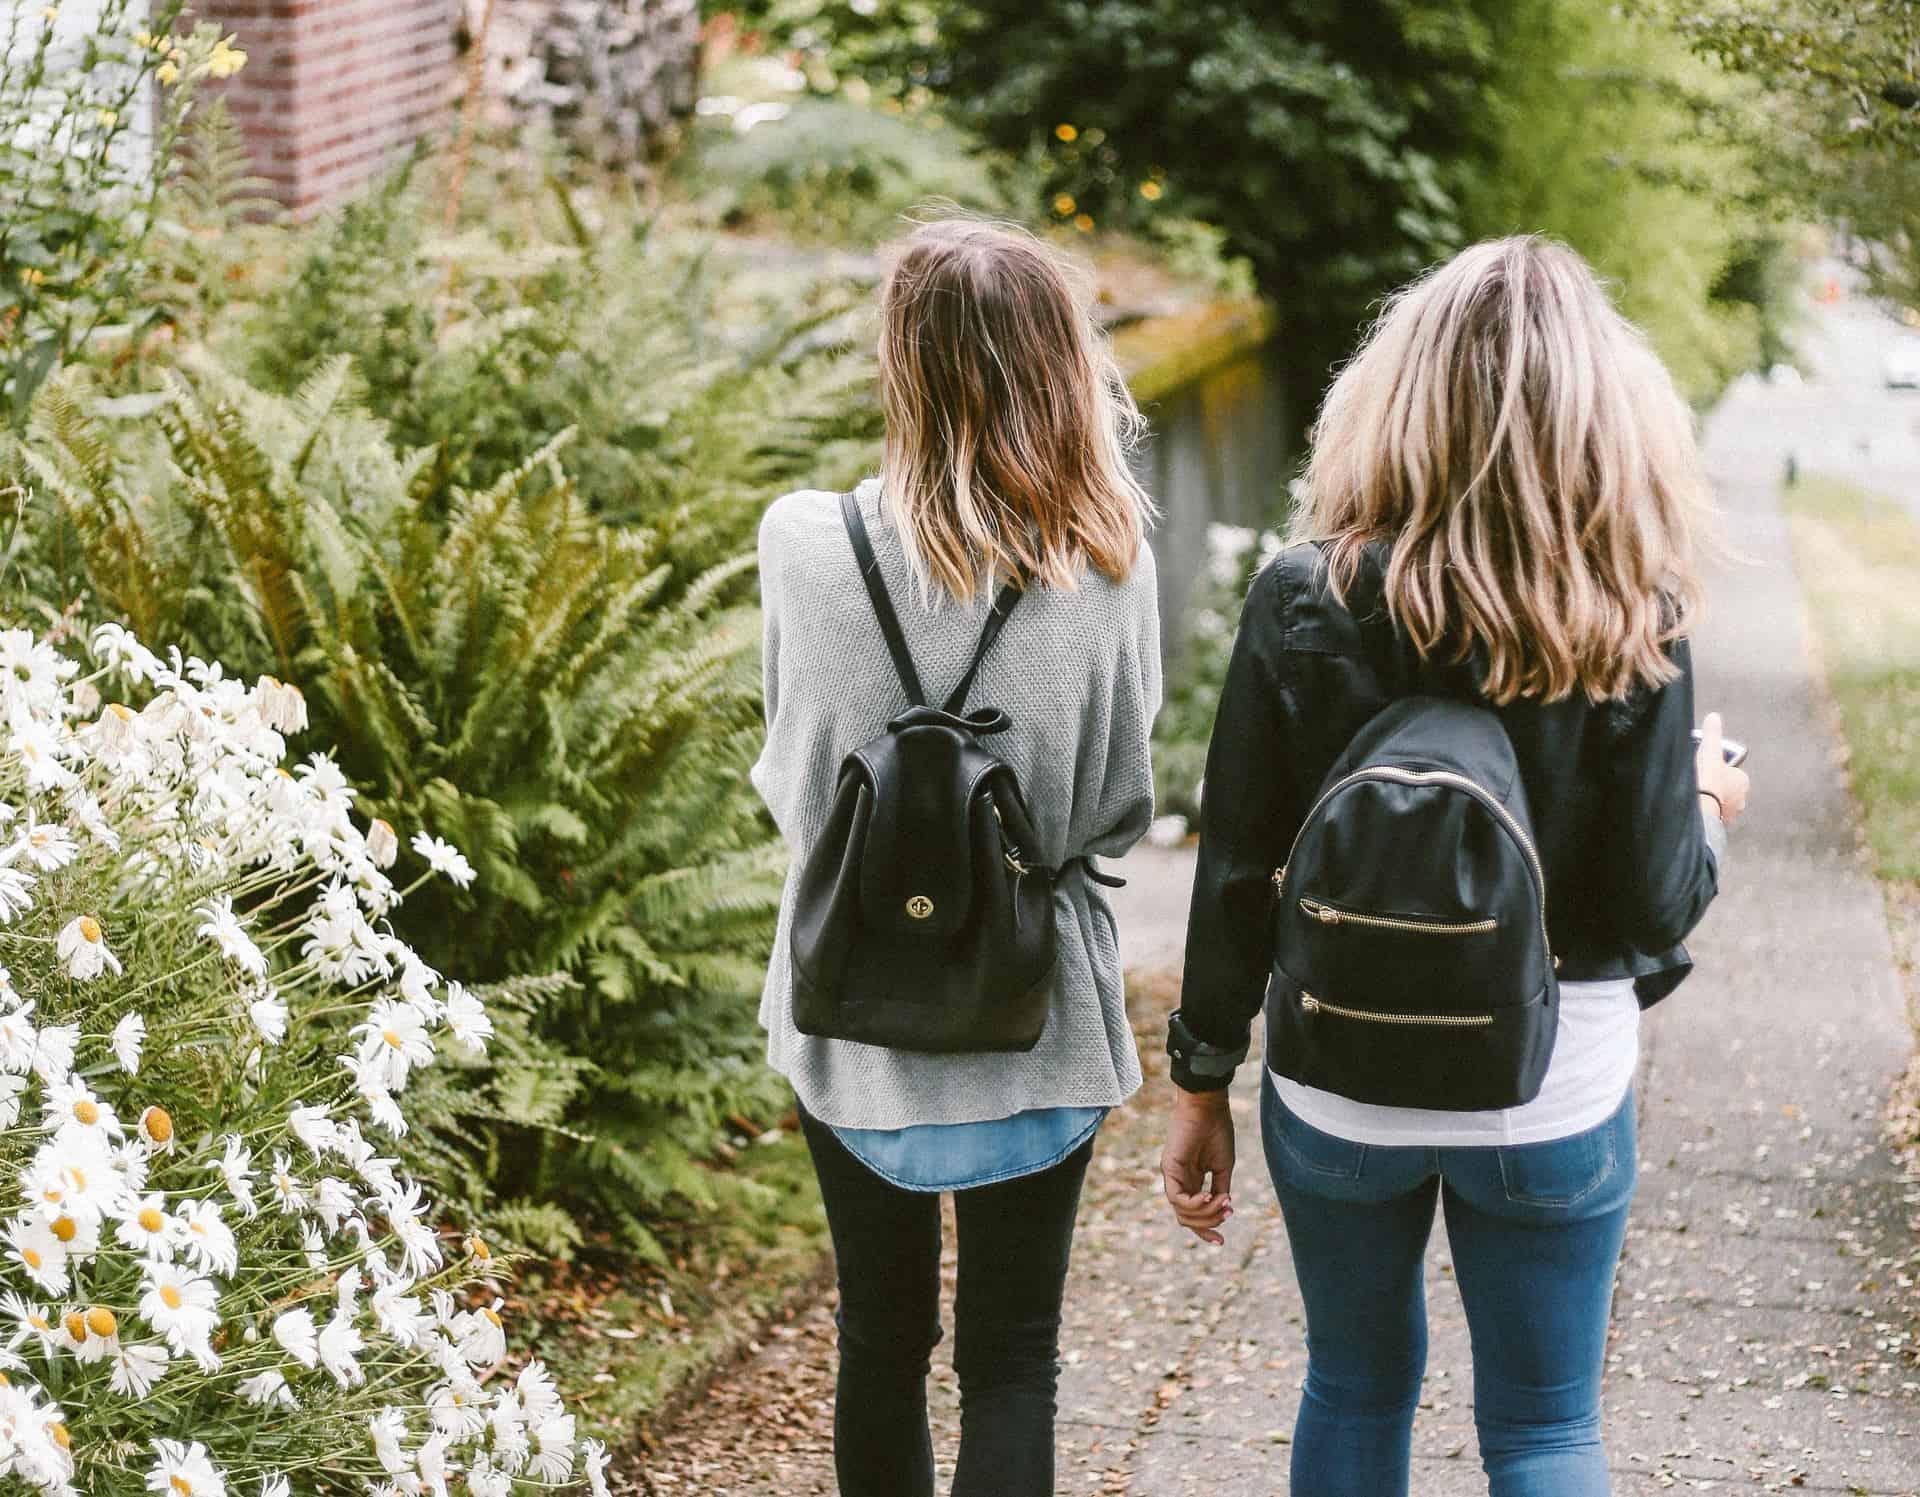 Adolescence: Developmental milestones of the Middle School Years   Washington DC